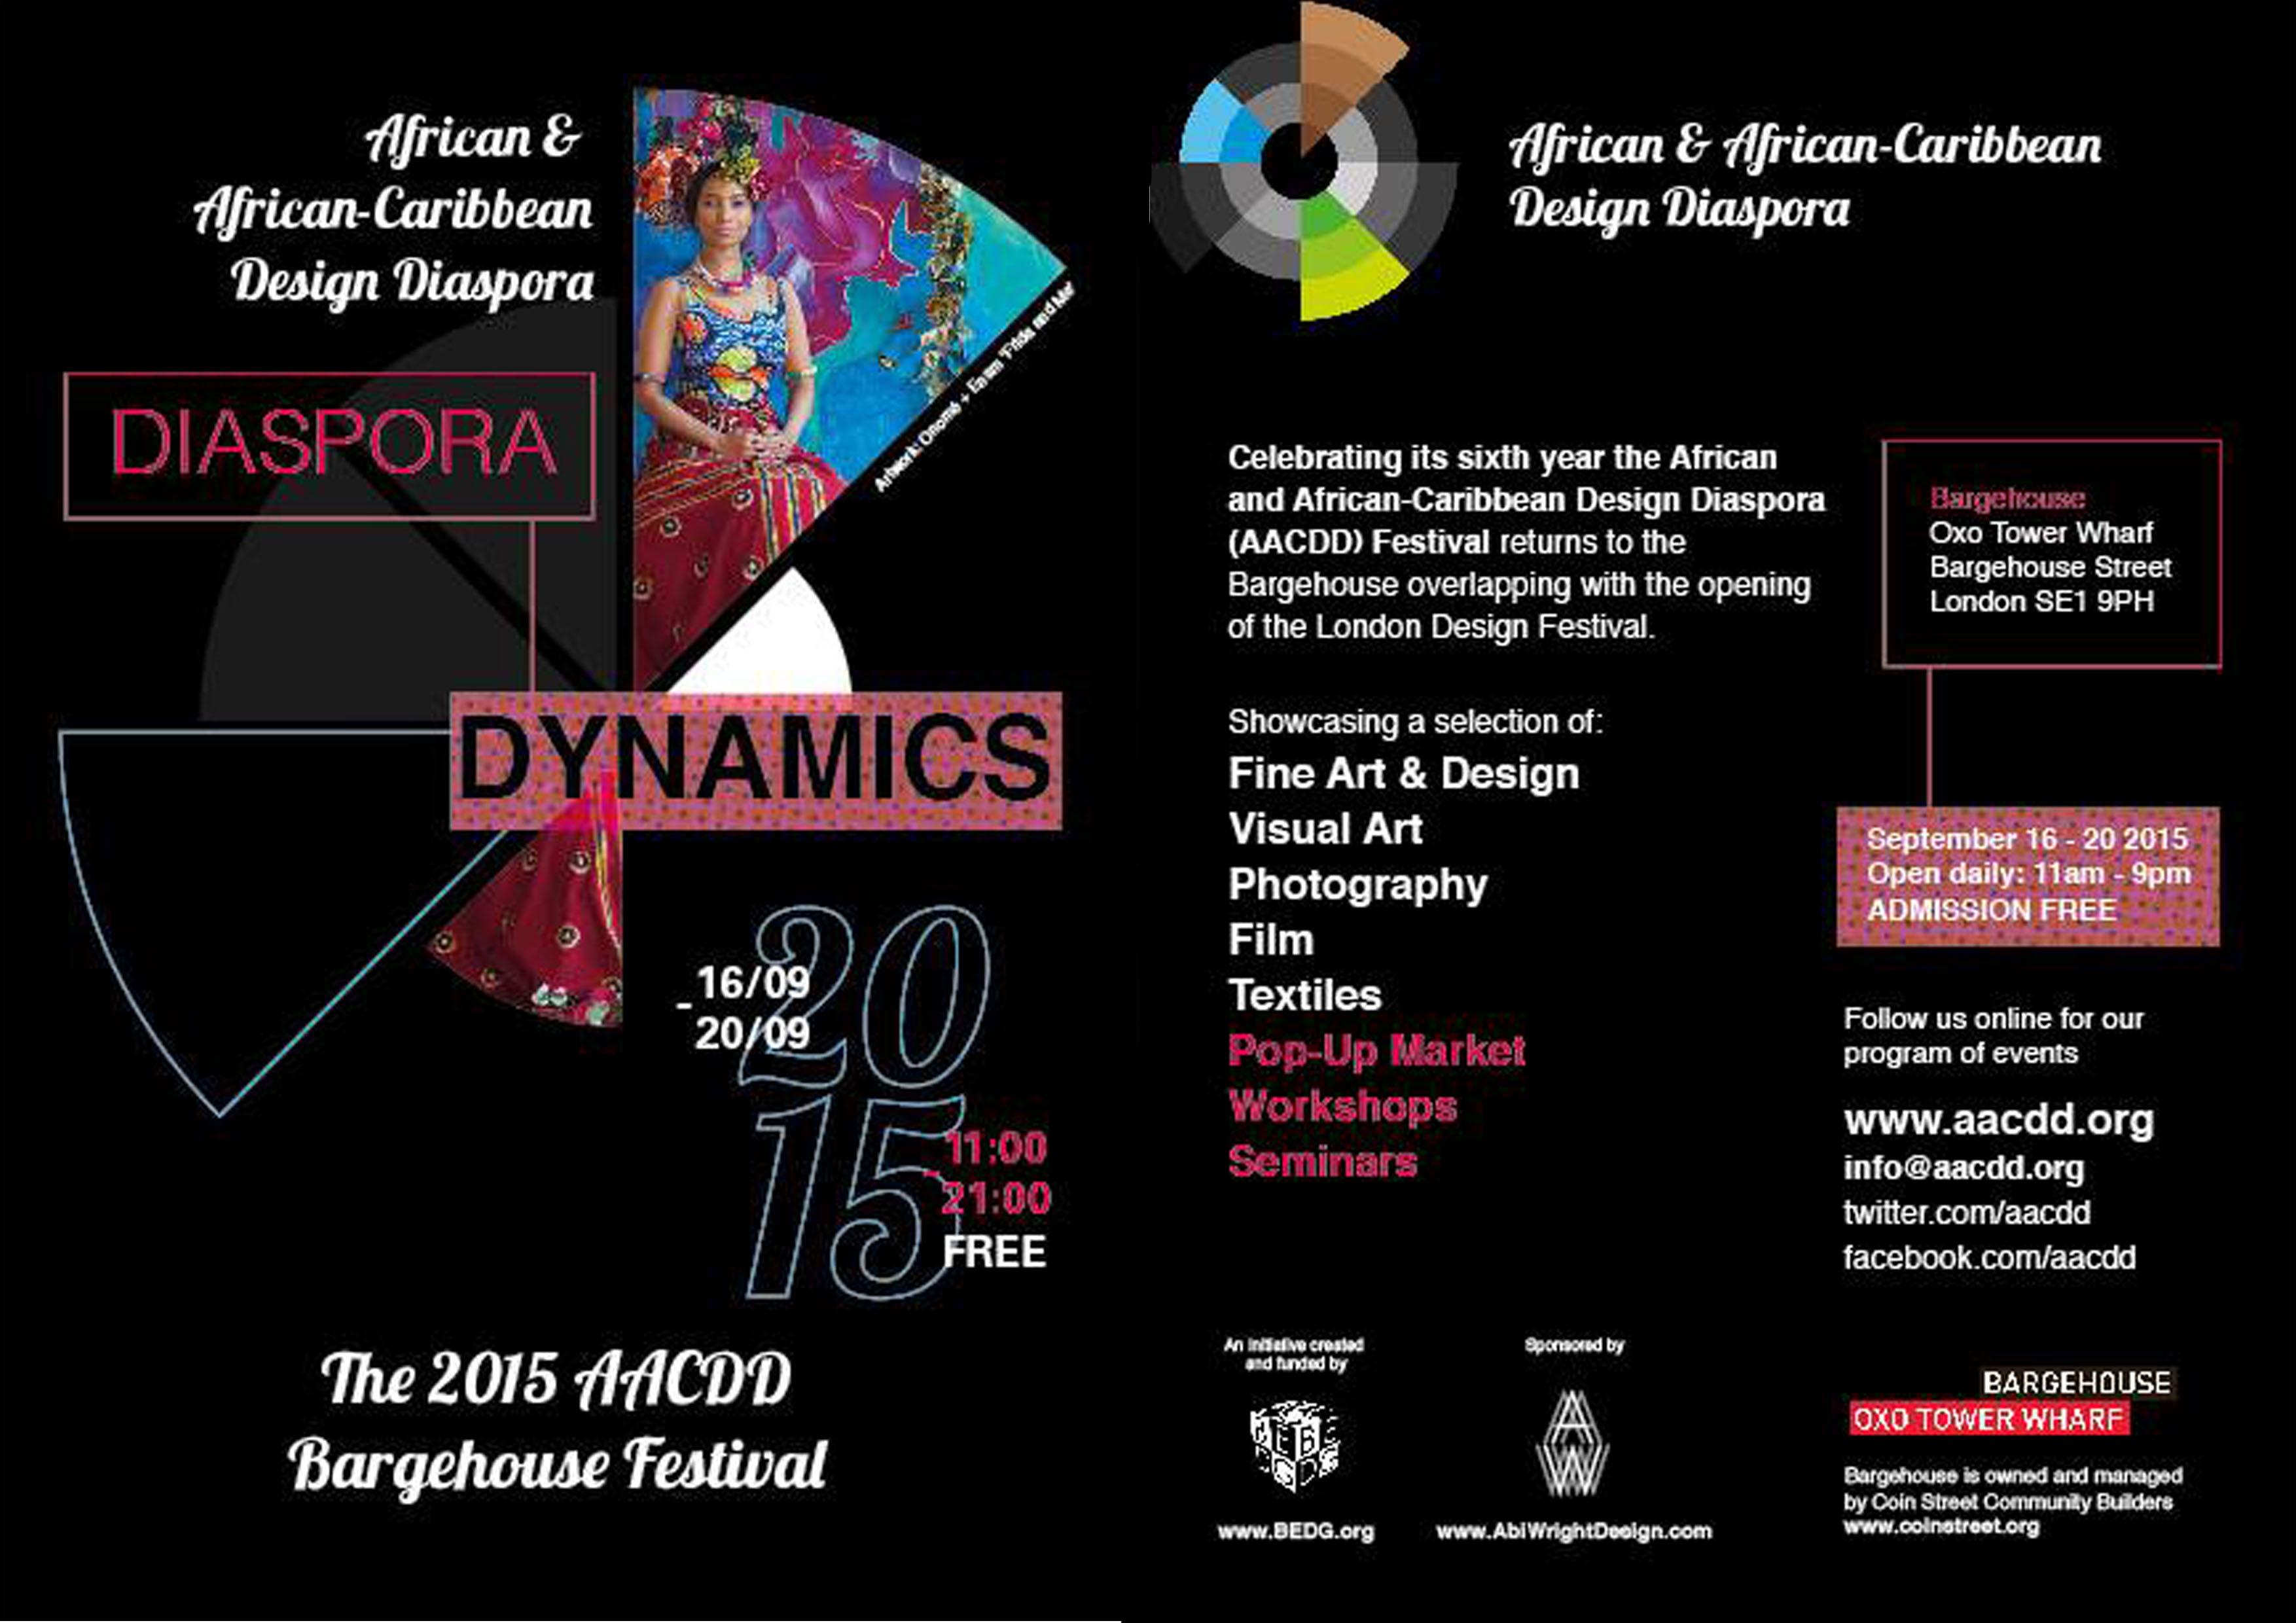 Diaspora Dynamics